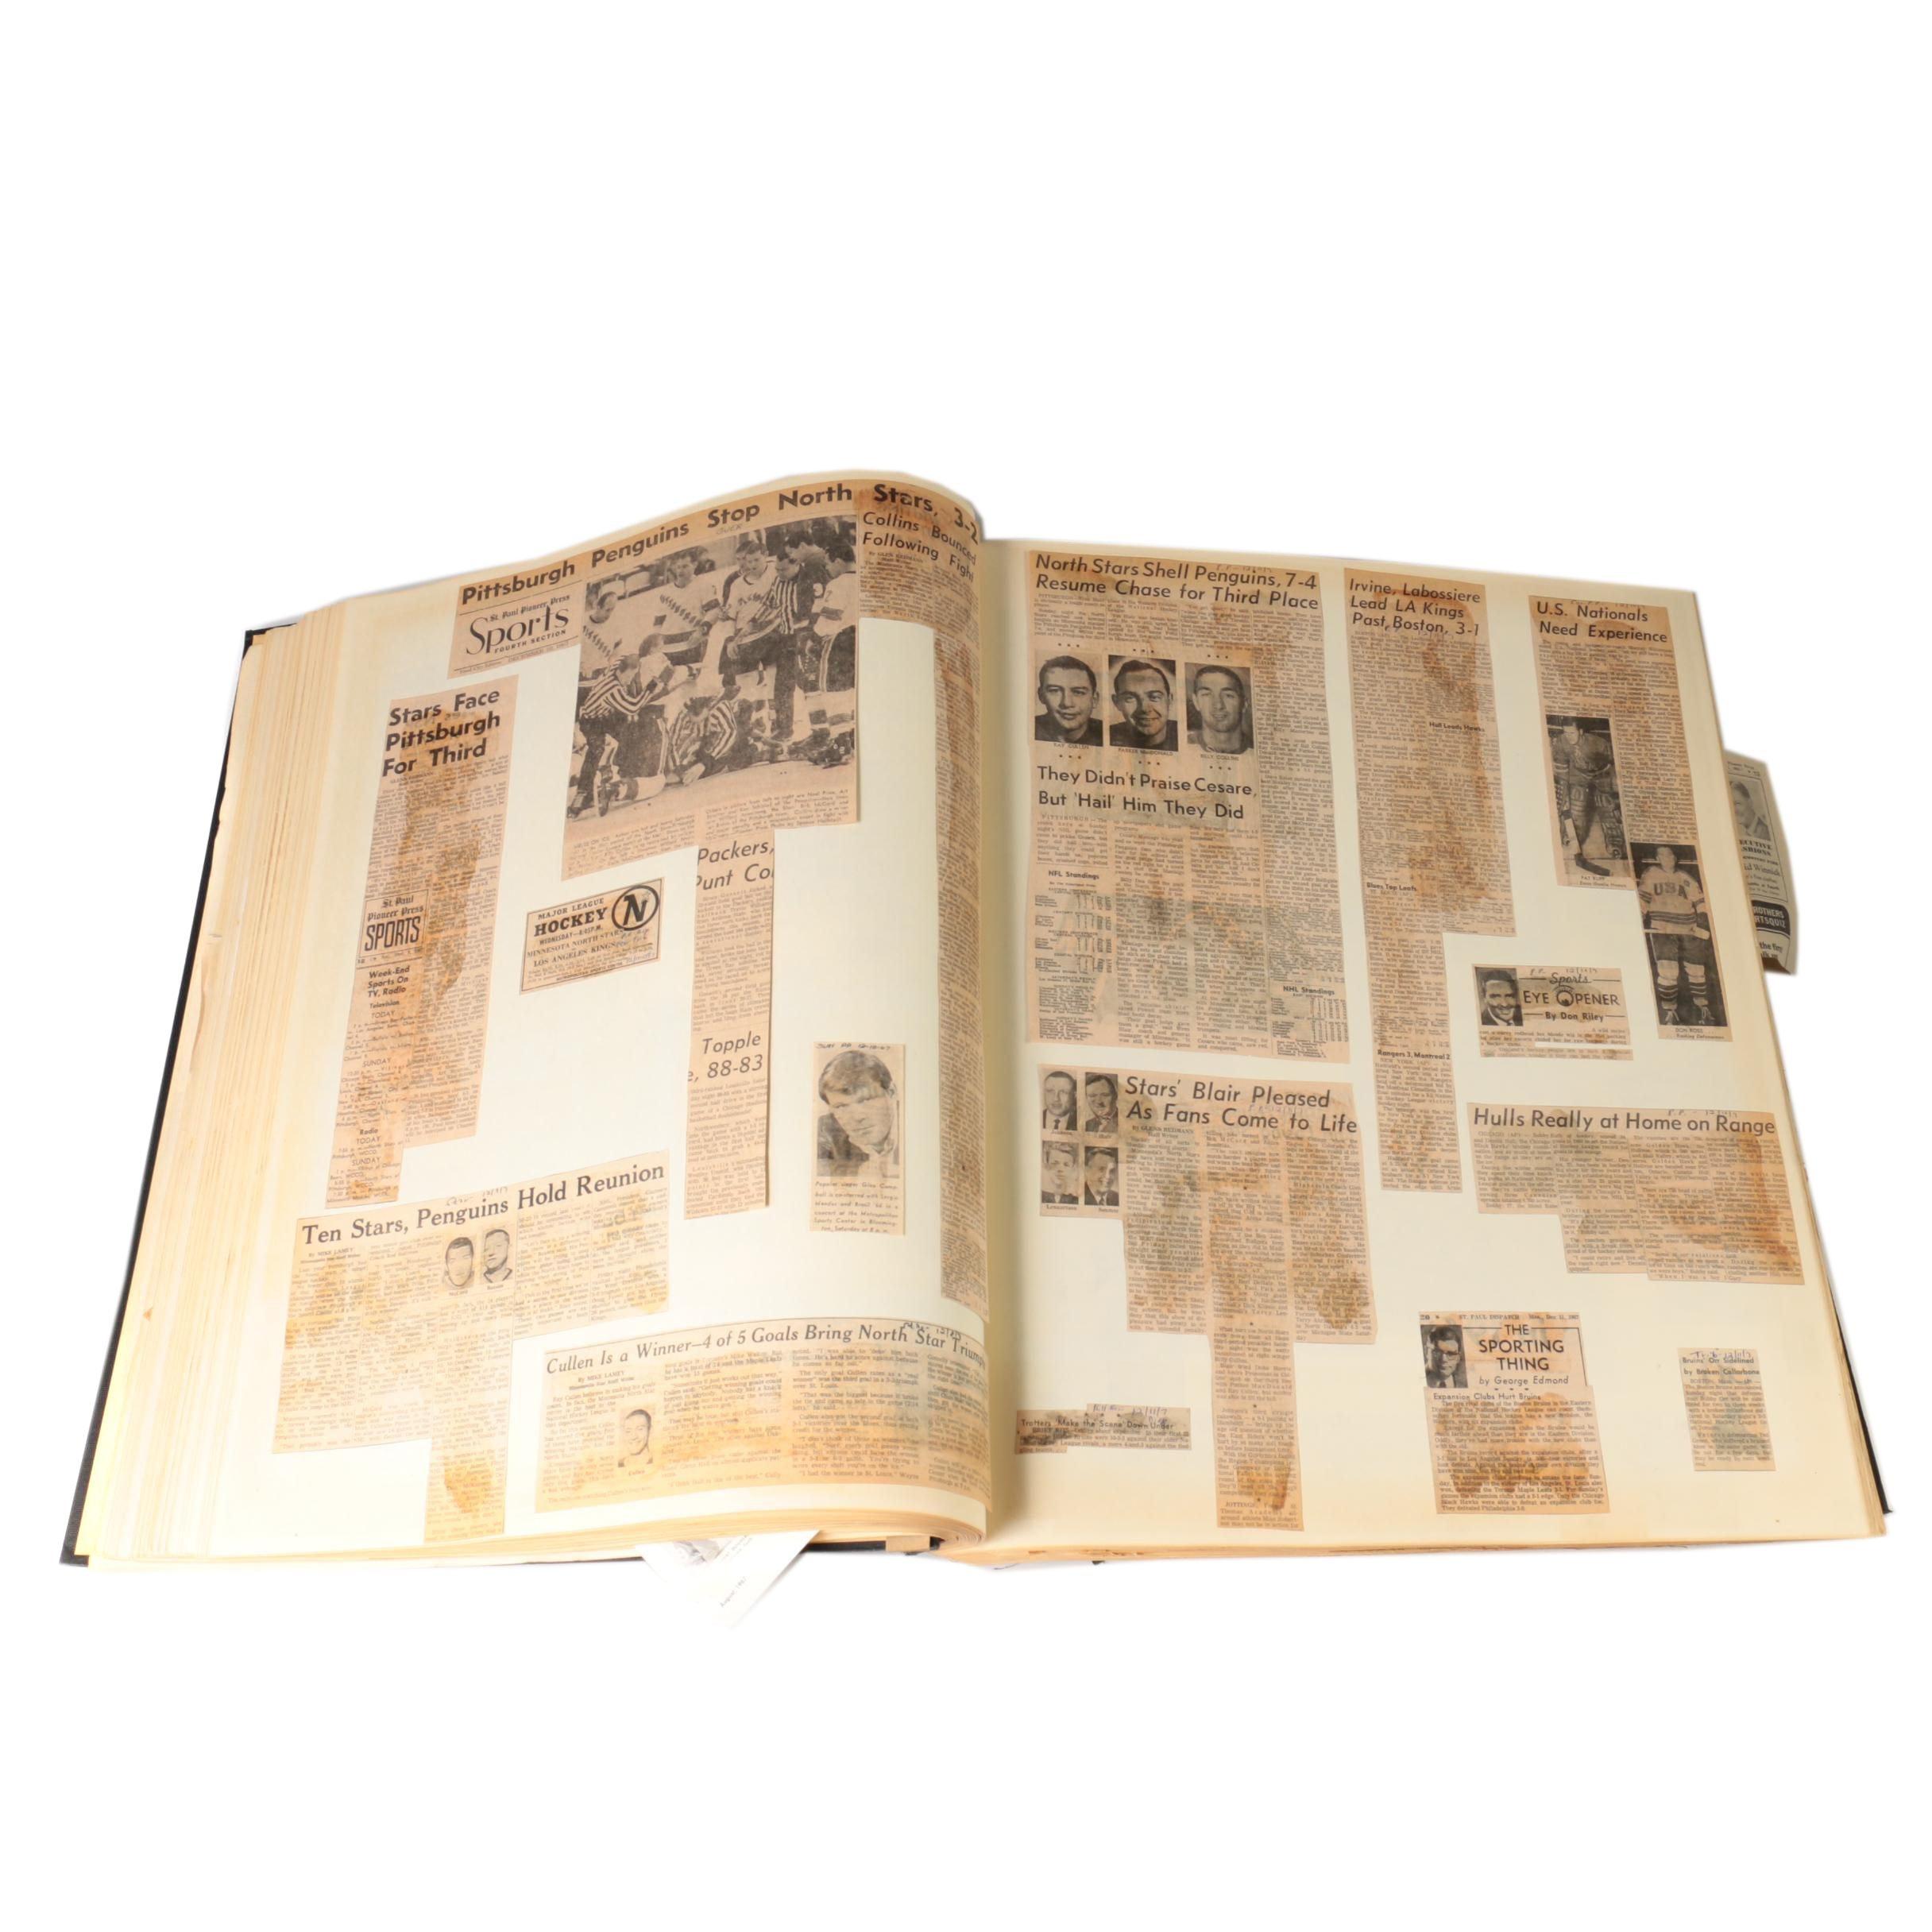 1967- 1968 Scrapbook Of Walter Bush, Jr.